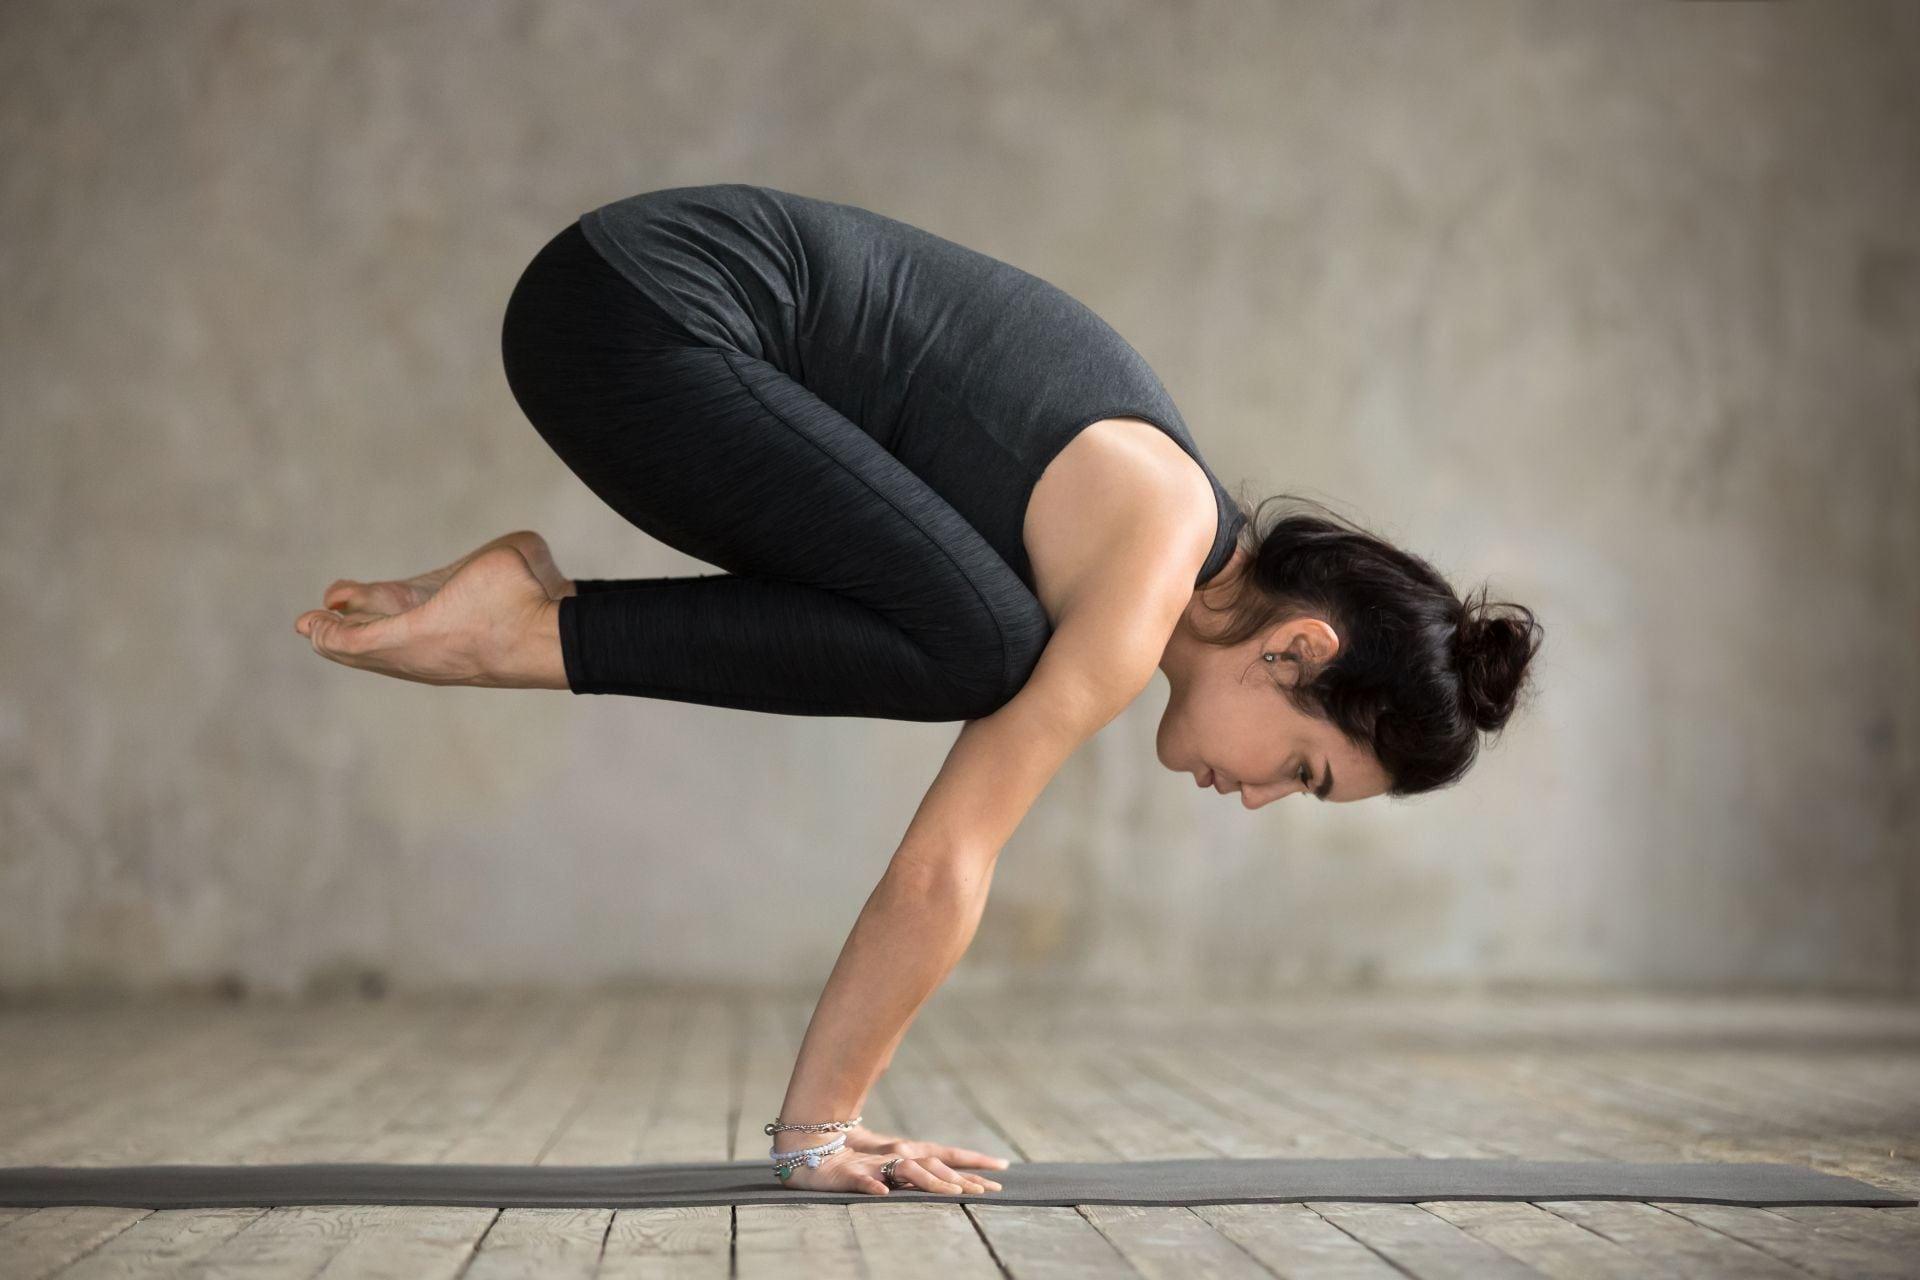 How to do Crow Pose (Bakasana) and Benefits - Yoga Blog